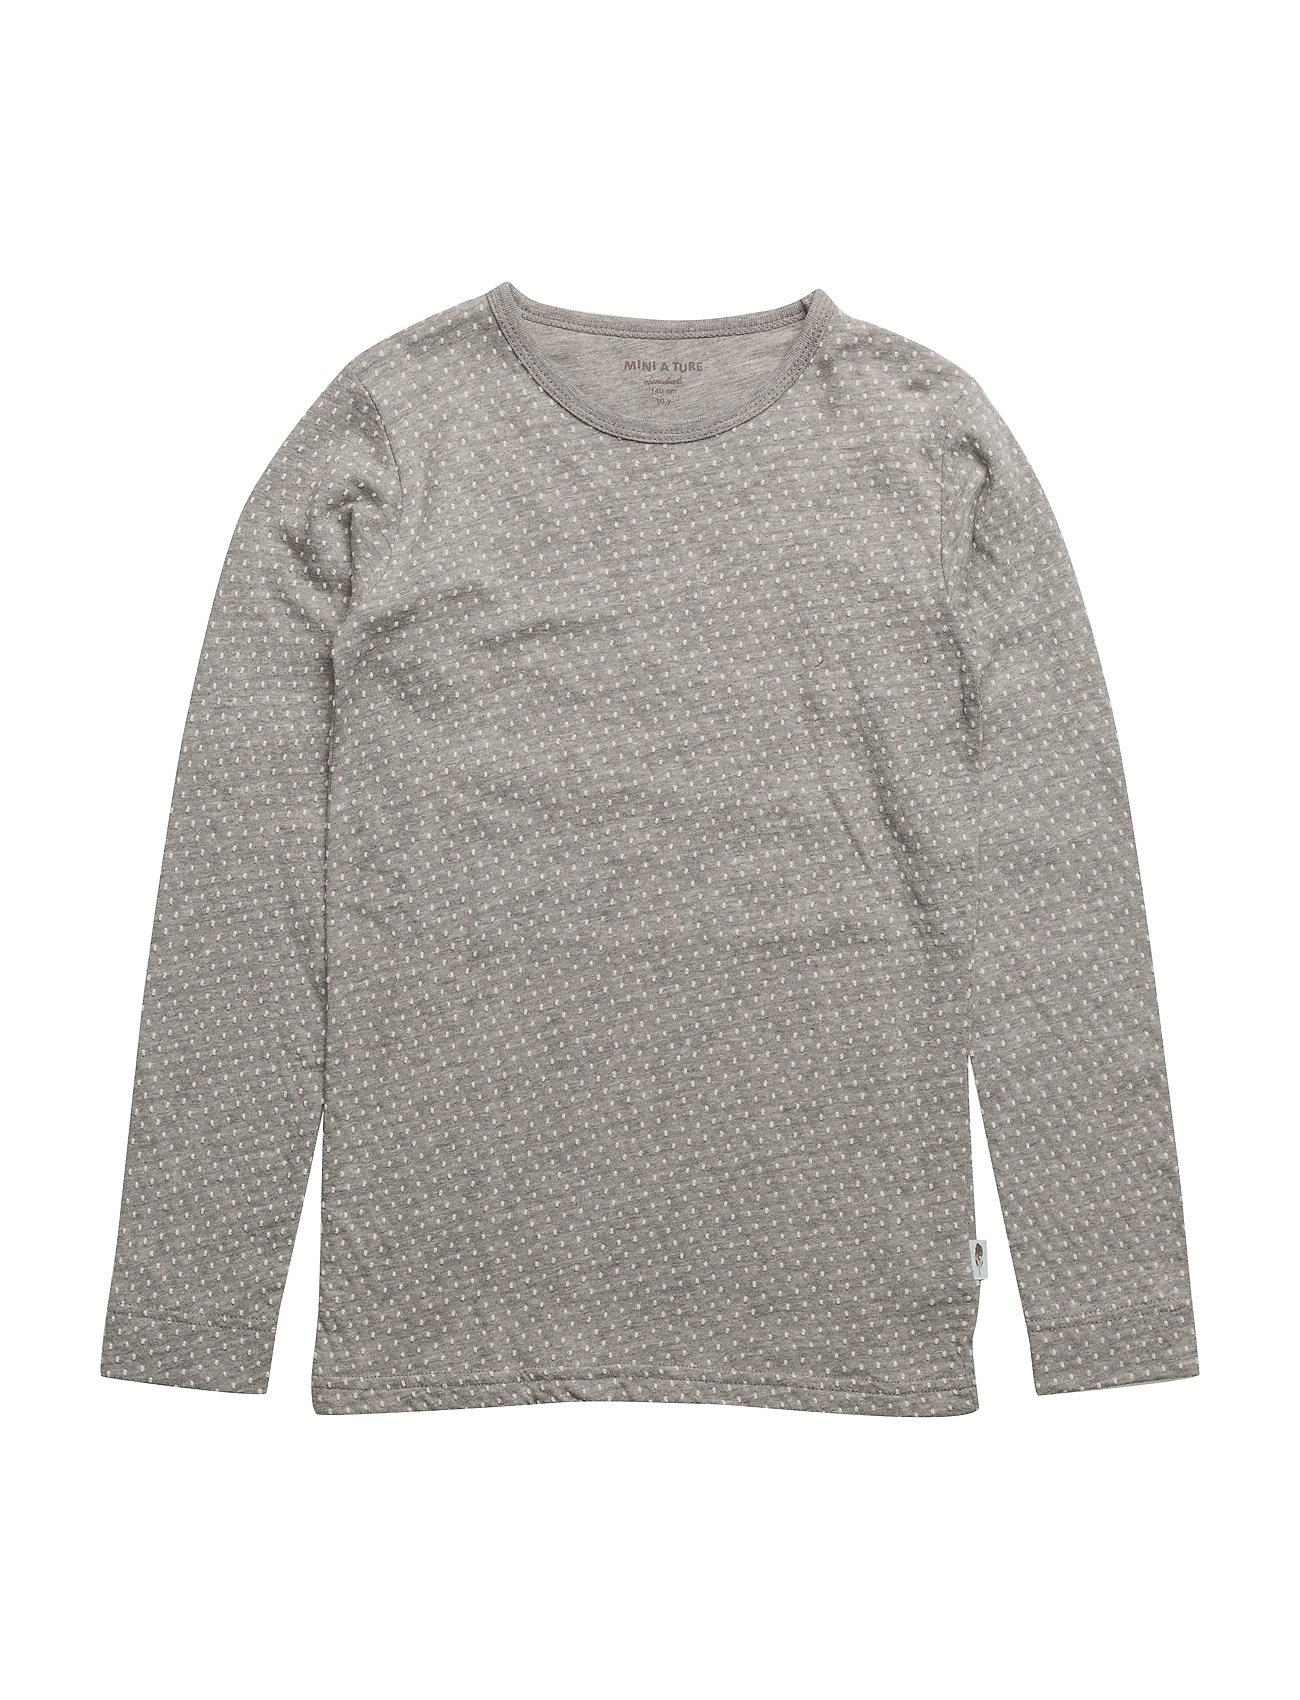 Mini A Ture Eddy T-shirt, MK - LIGHT GREY MELANGE